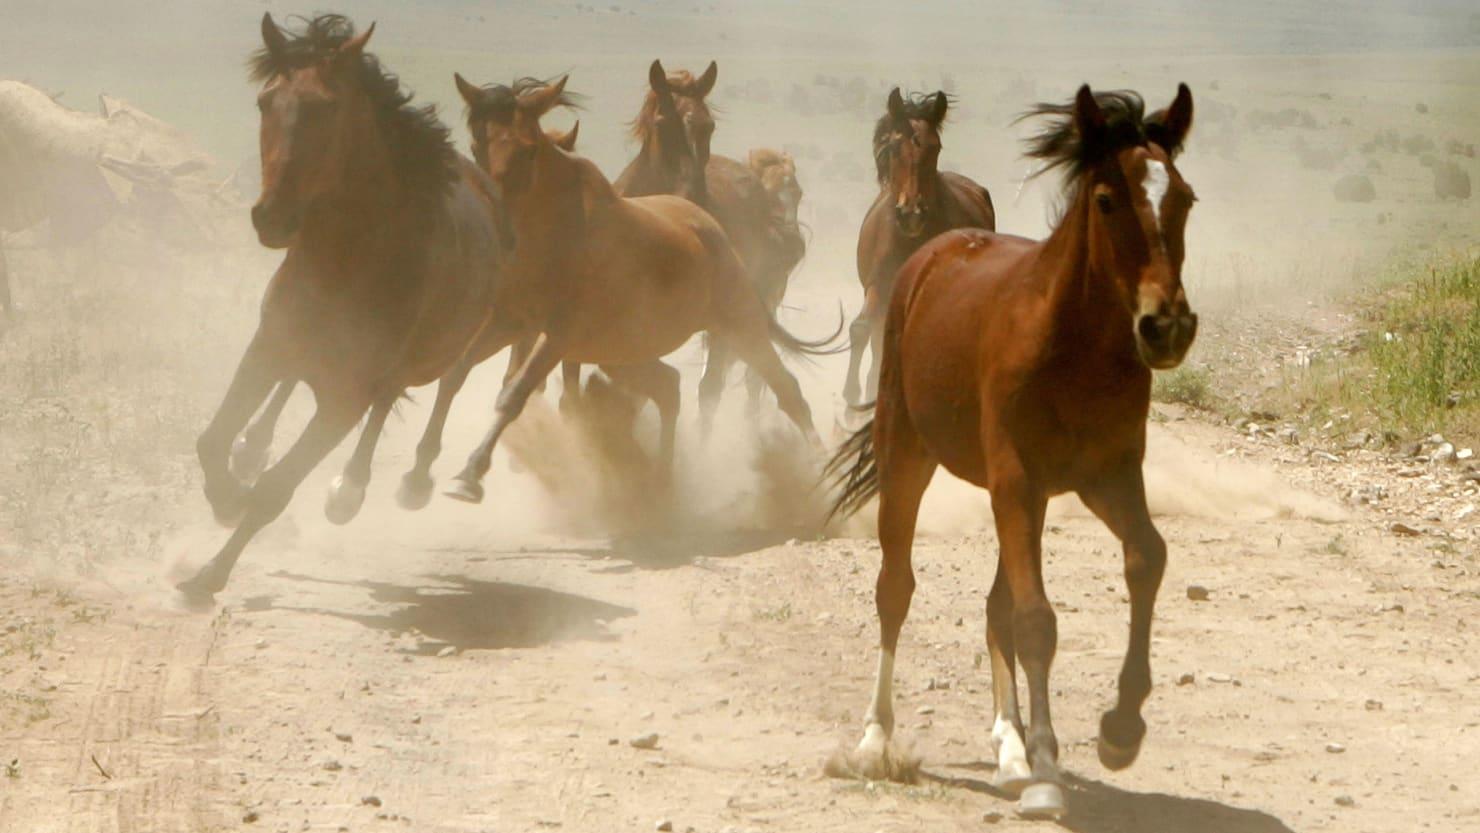 170710-Ketcham-wild-horses-tease_qzeter